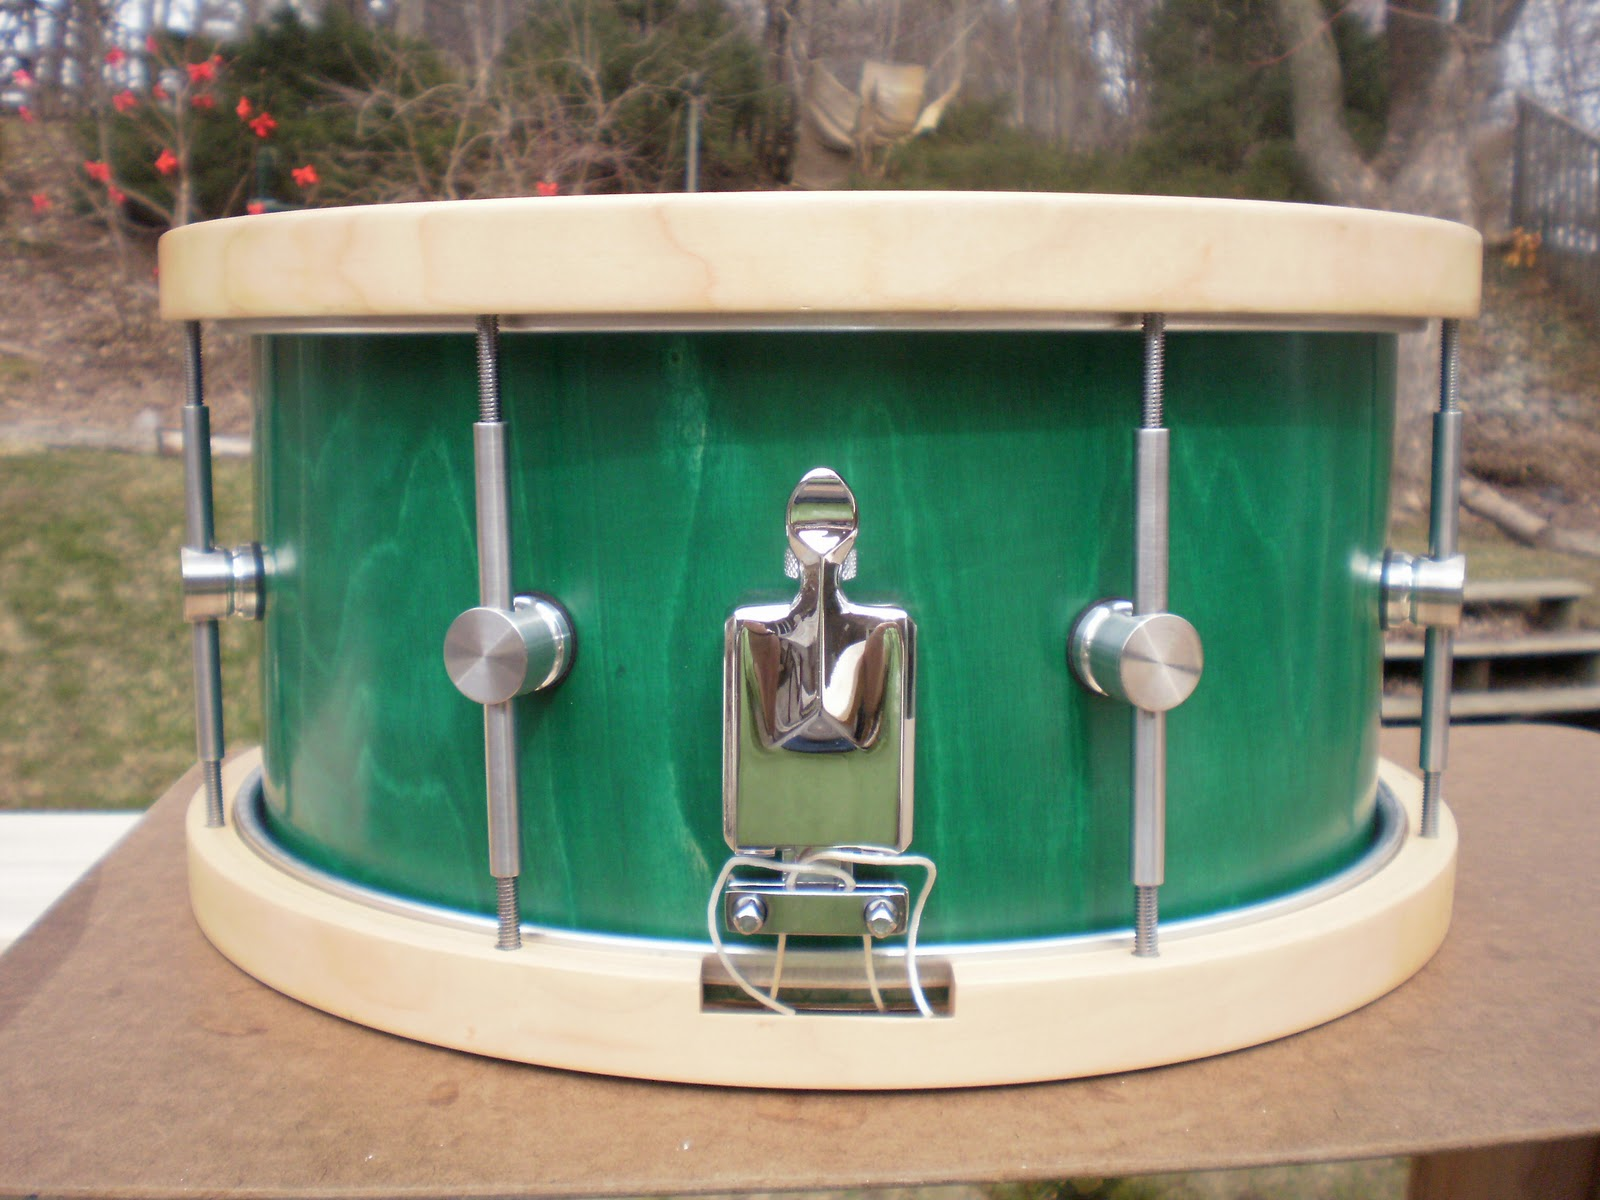 Tumbling Boulders Drums: February 2011